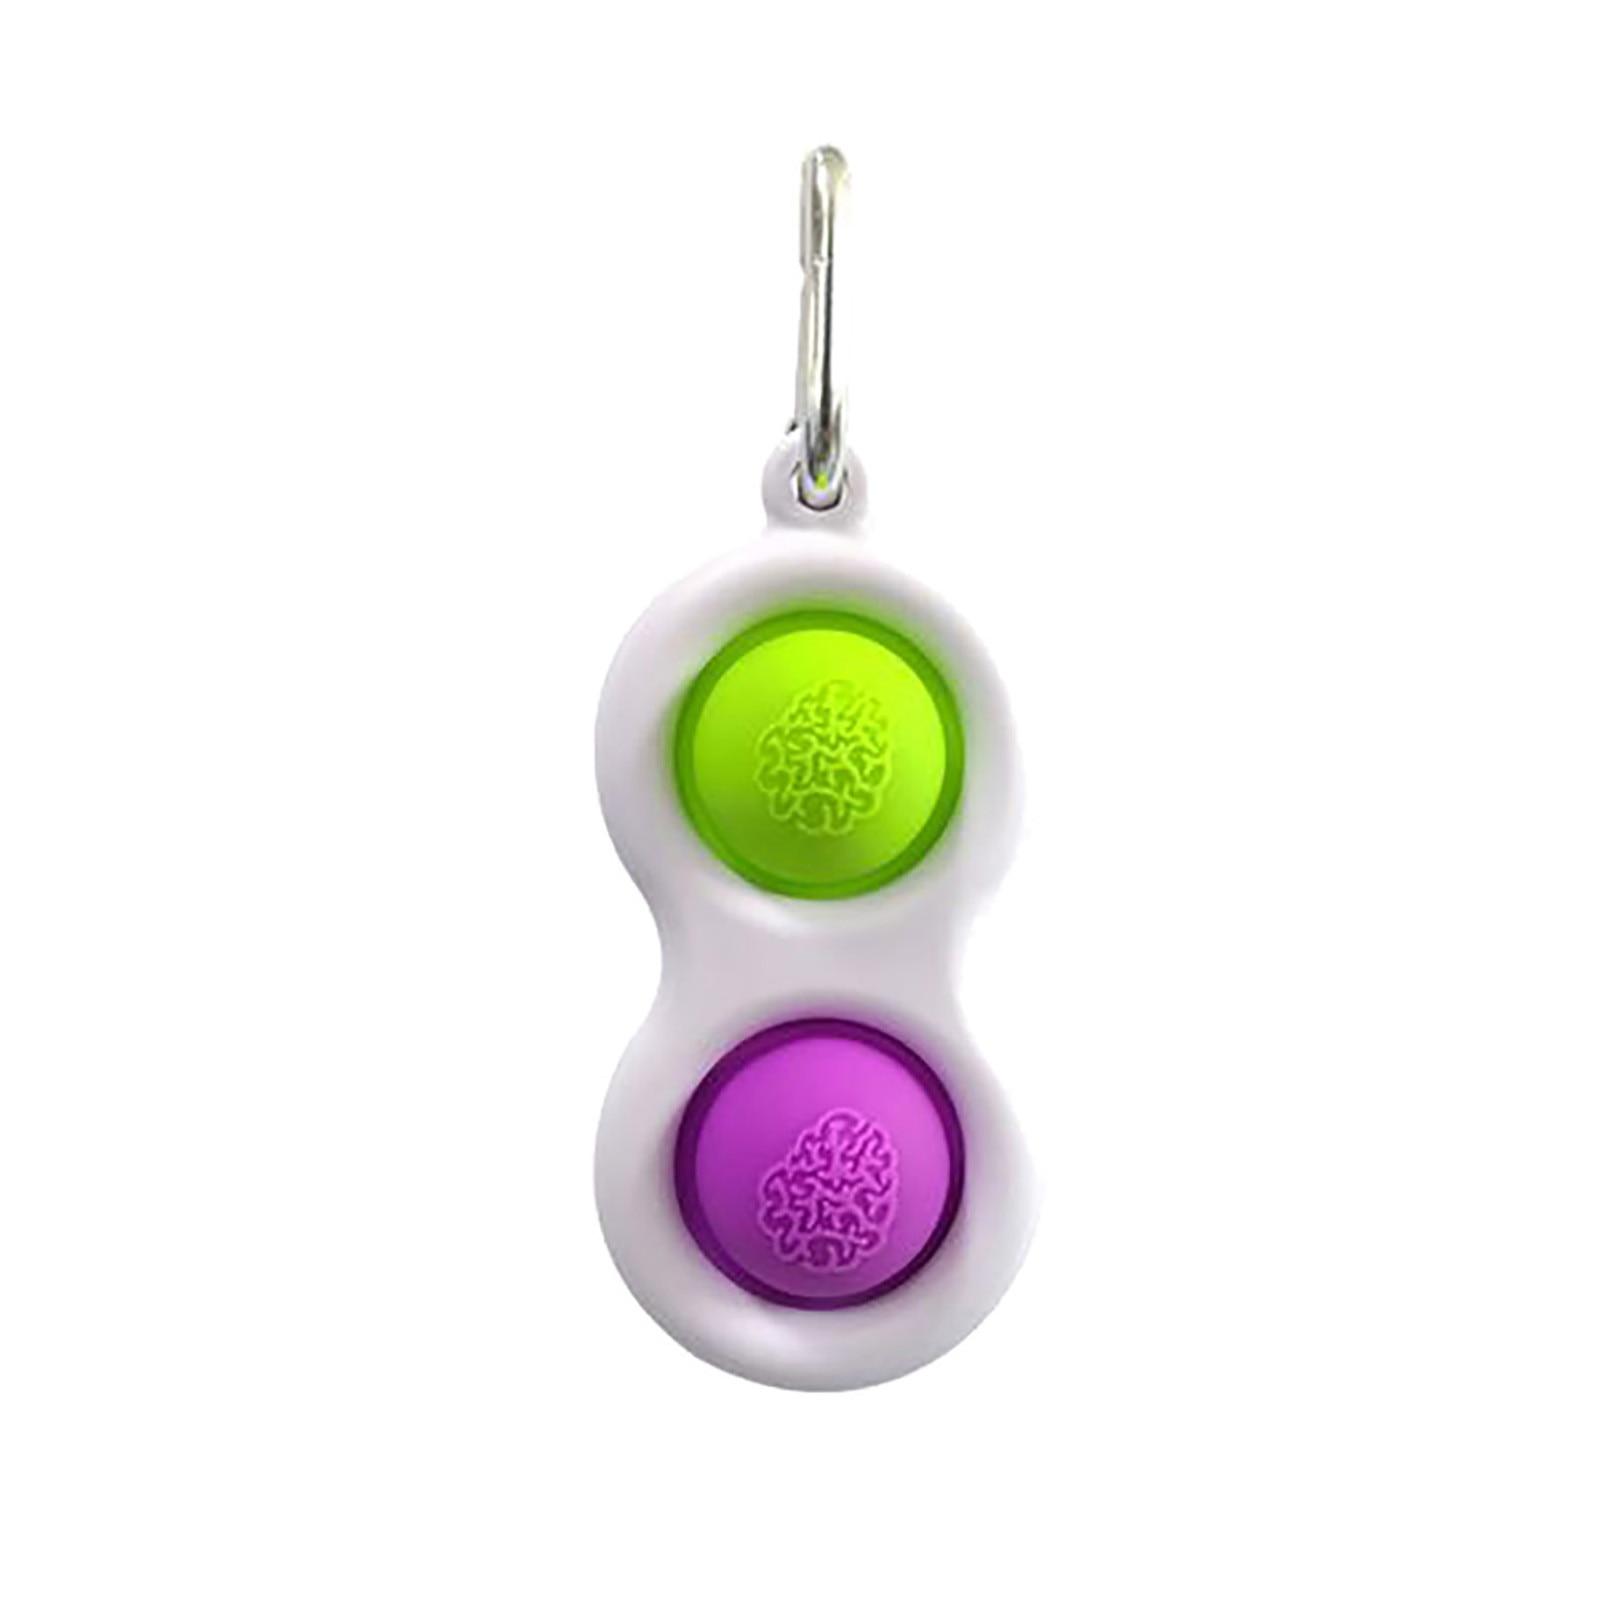 Keychain Fidget-Toys Decompression Toy Stress Relief Dimple Antysresowe for Children img5